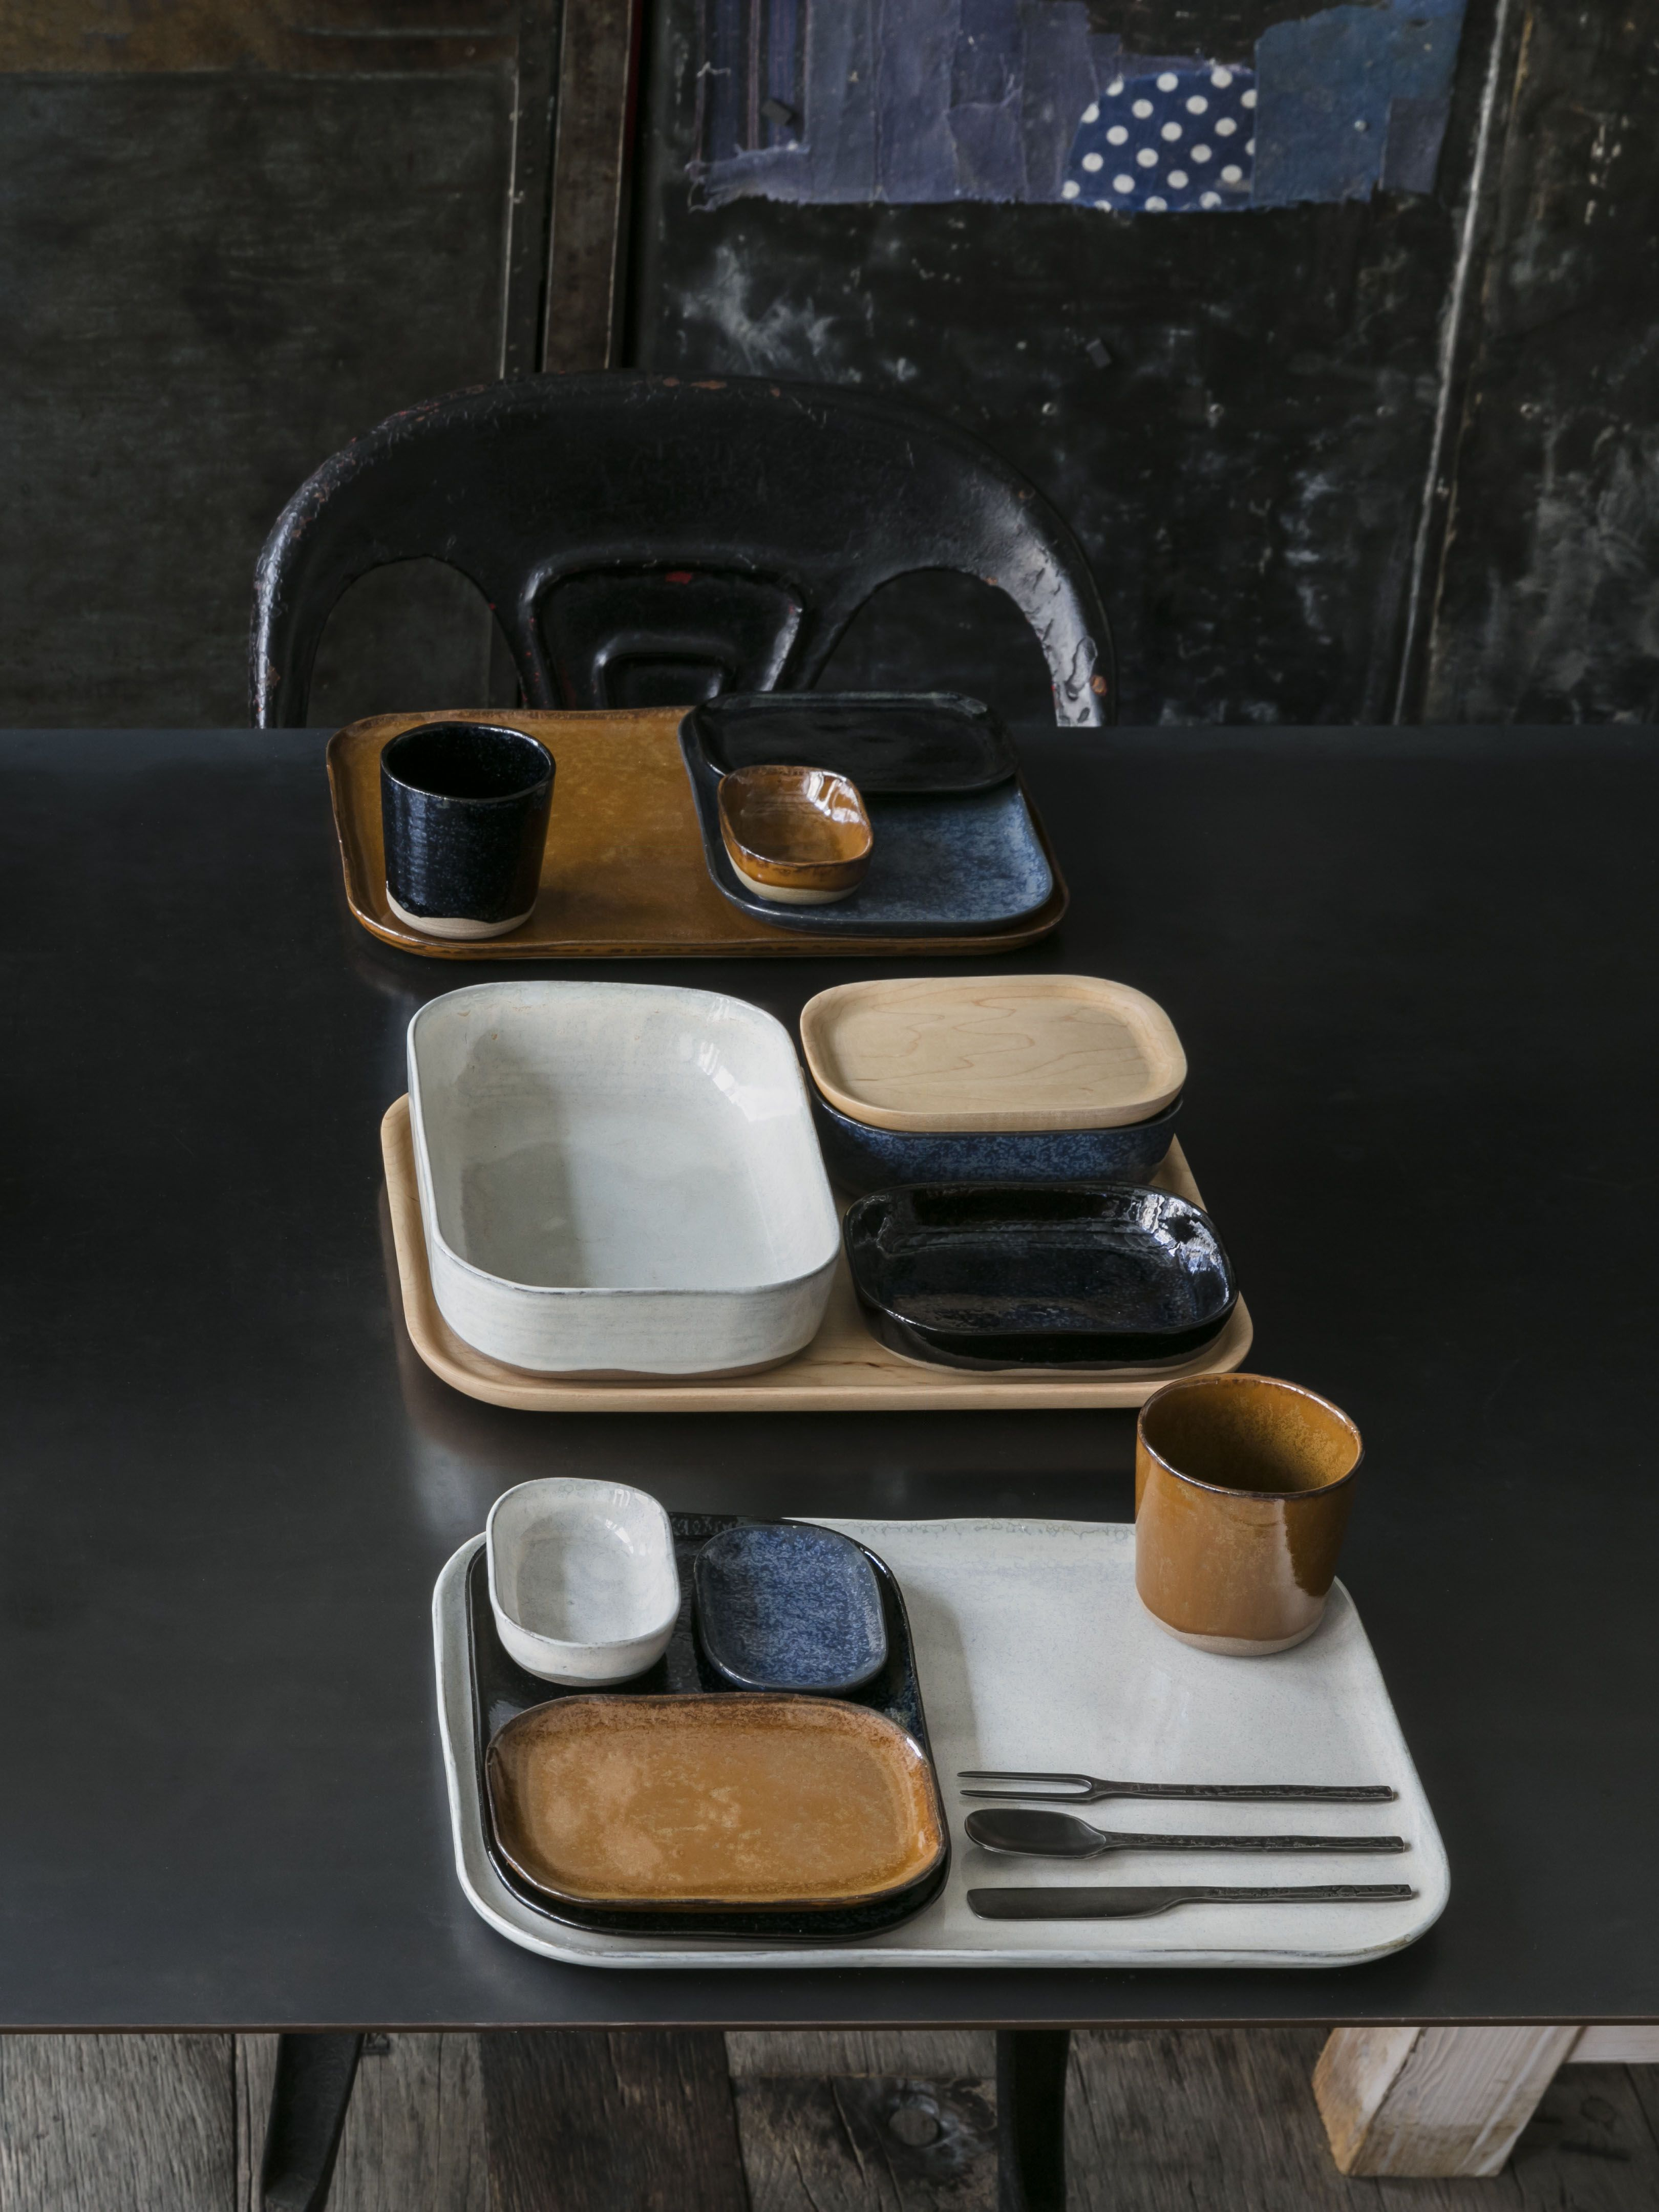 assiette creuse en gr s inspir e du c l bre service. Black Bedroom Furniture Sets. Home Design Ideas